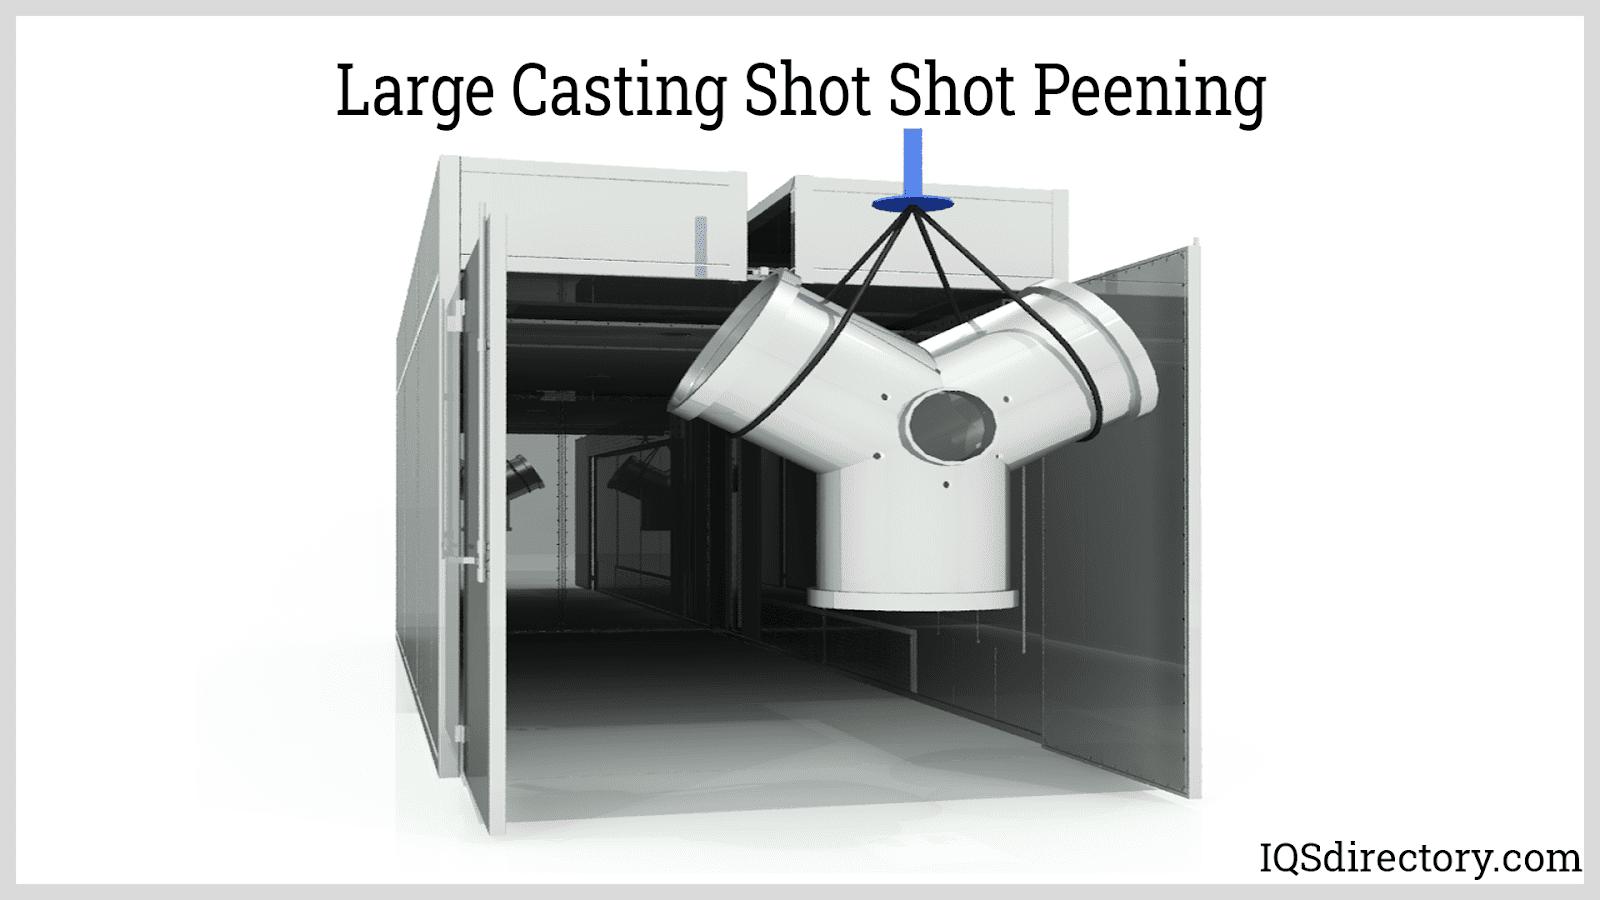 Large Casting Shot Shot Peening